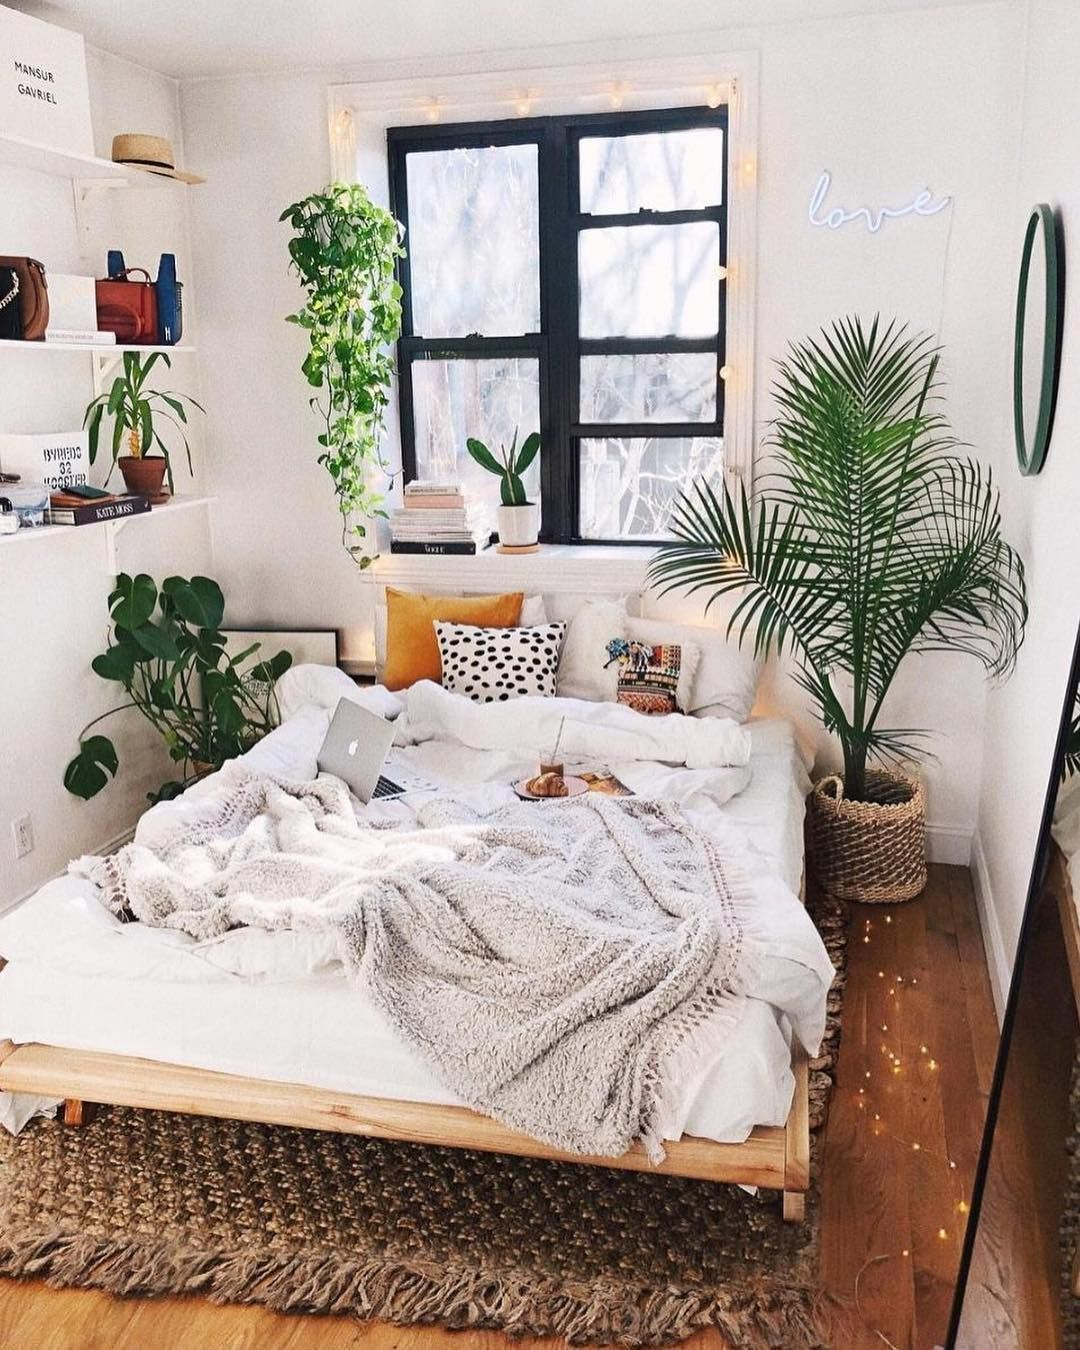 Urban Outfitters Huis Op Instagram Droom Slaapkamer Inspo Met